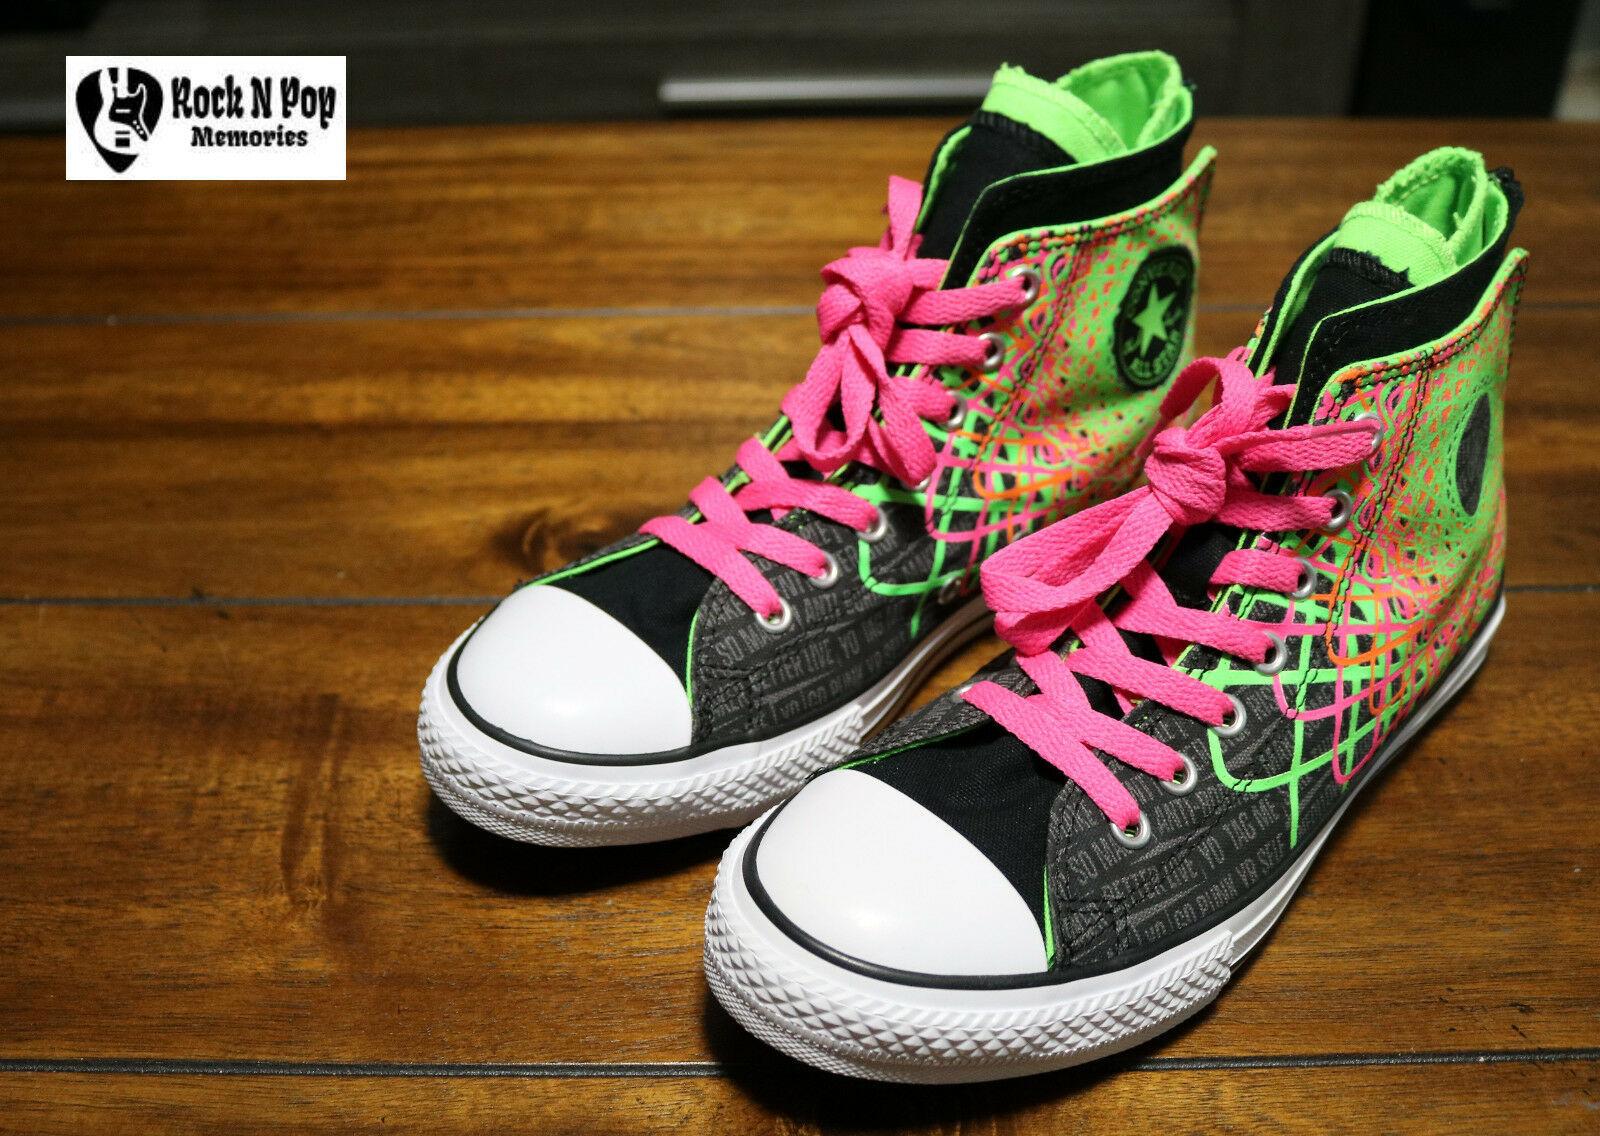 Converse Chuck Taylor All Star Zipback 649963C Black Pink Green Shoes Girls Sz 5